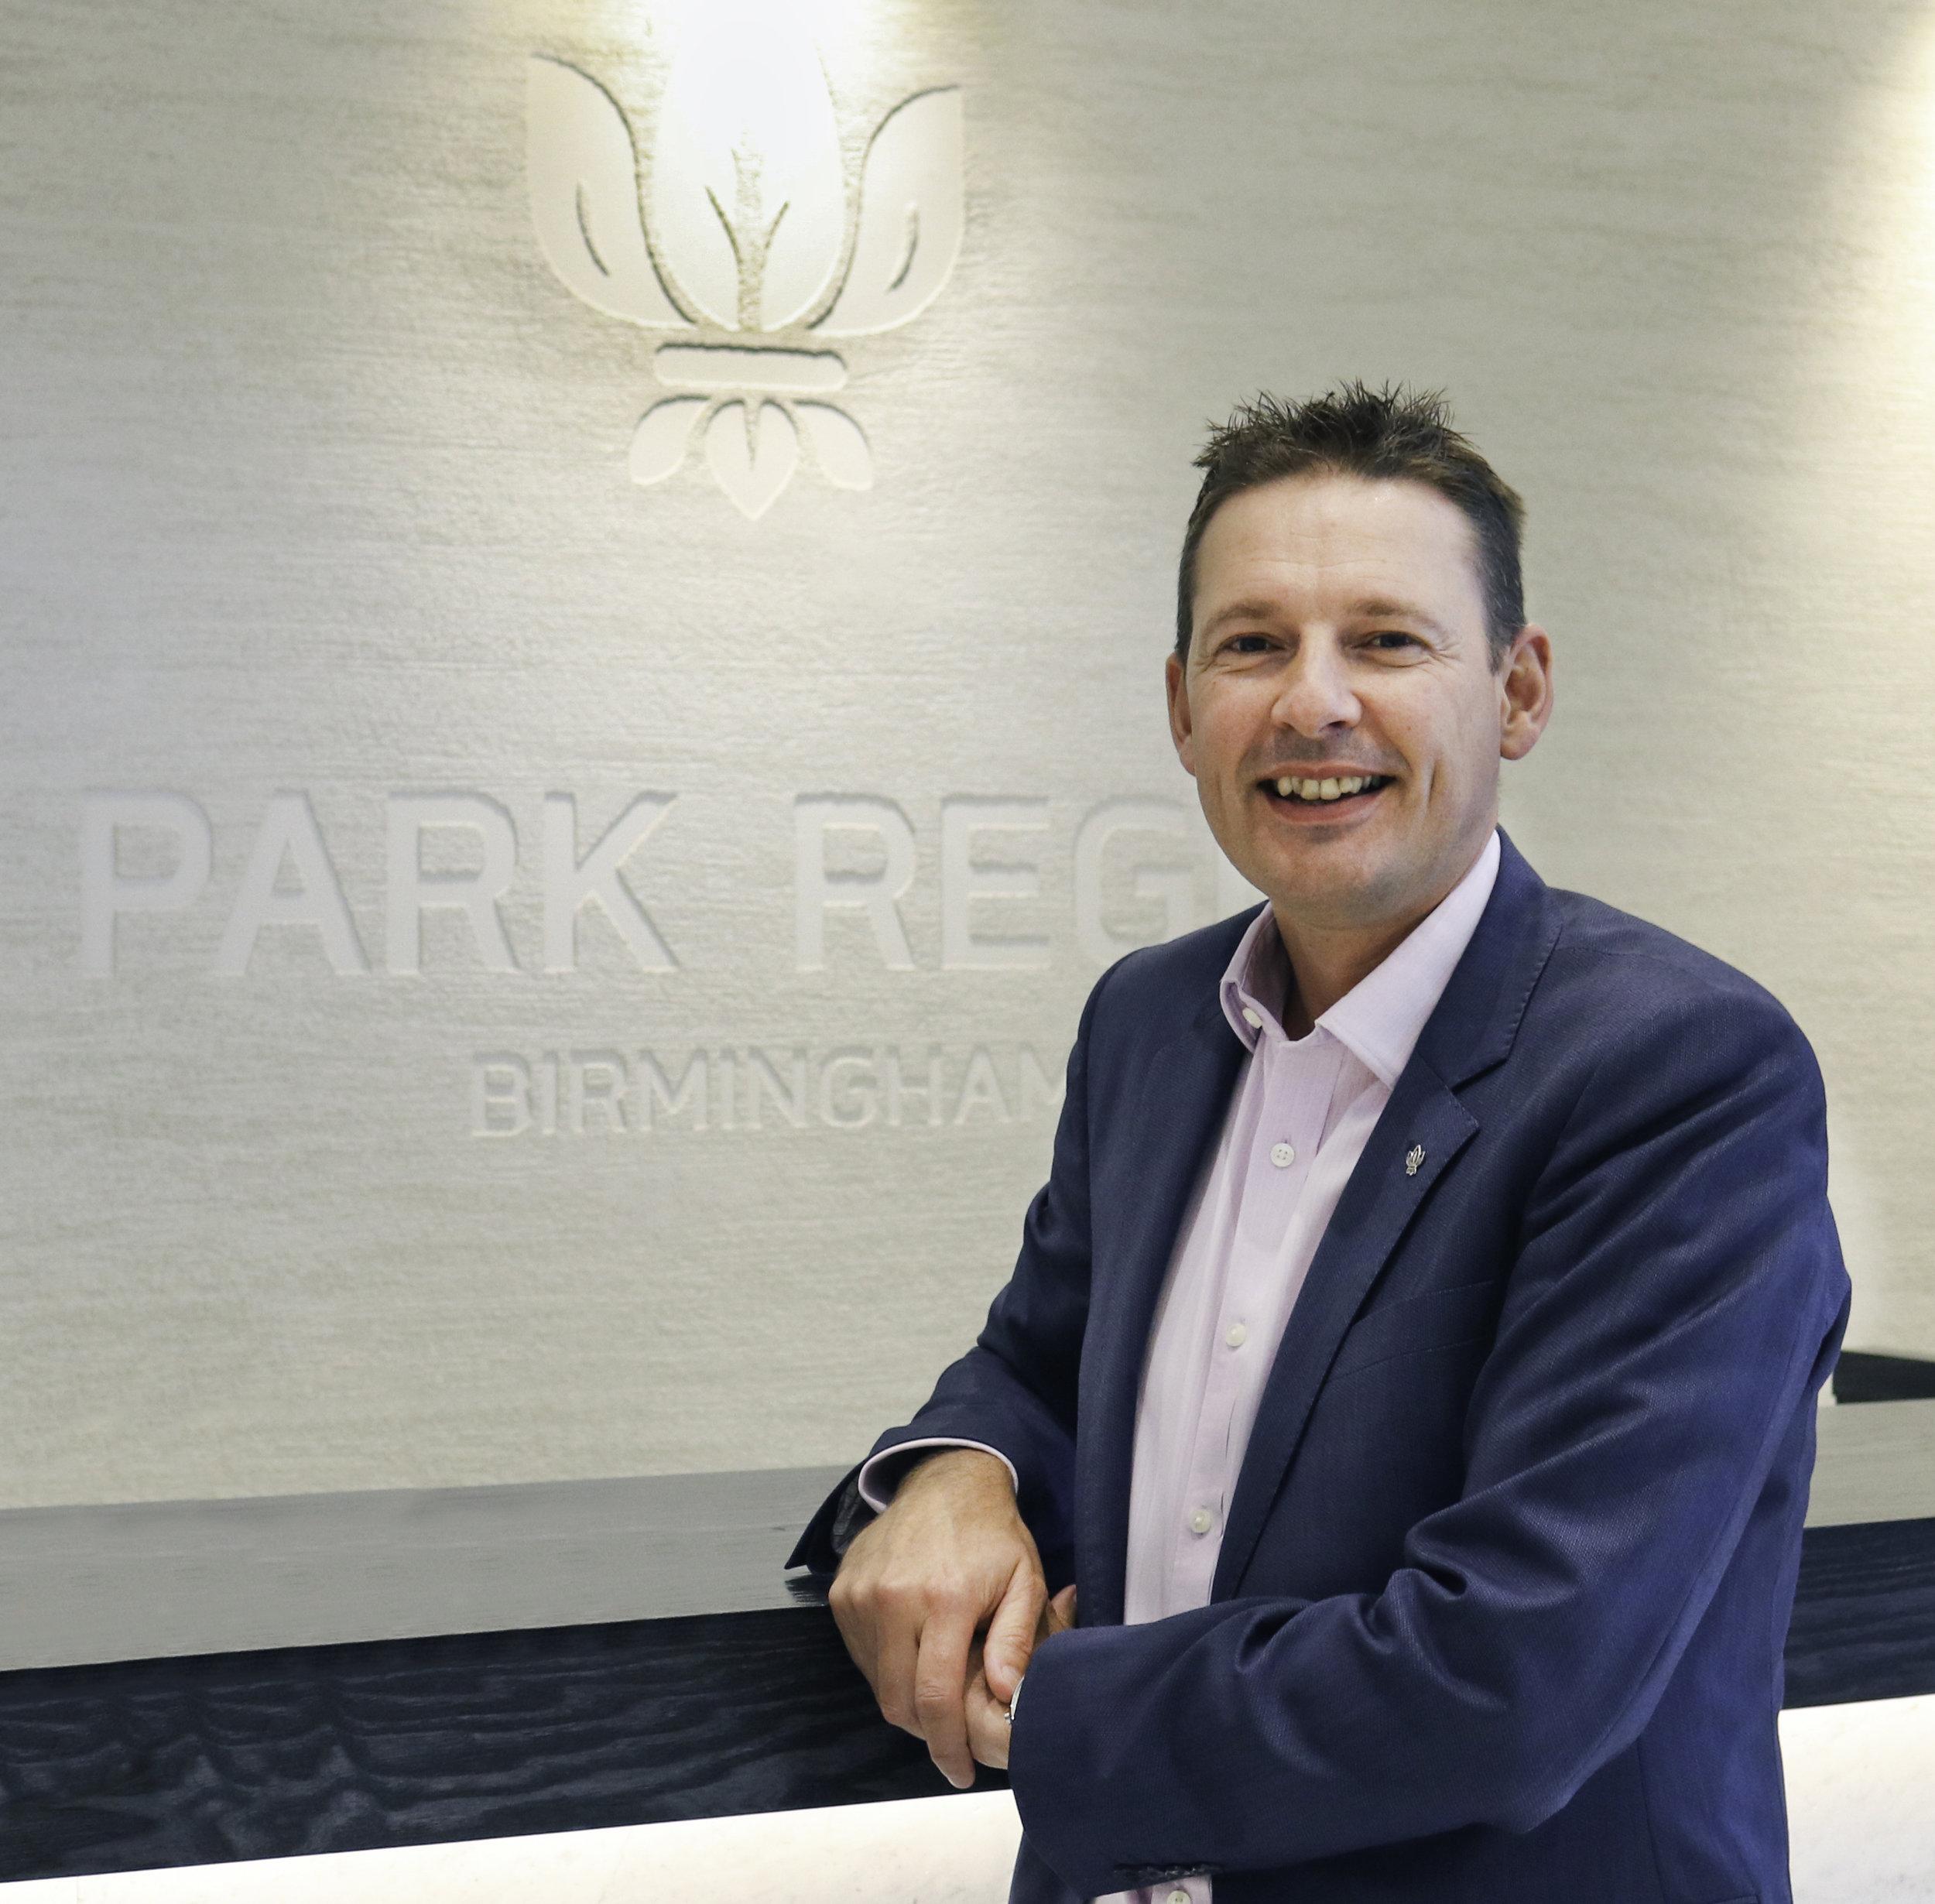 Mark Payne, GM of Park Regis Birmingham.jpg